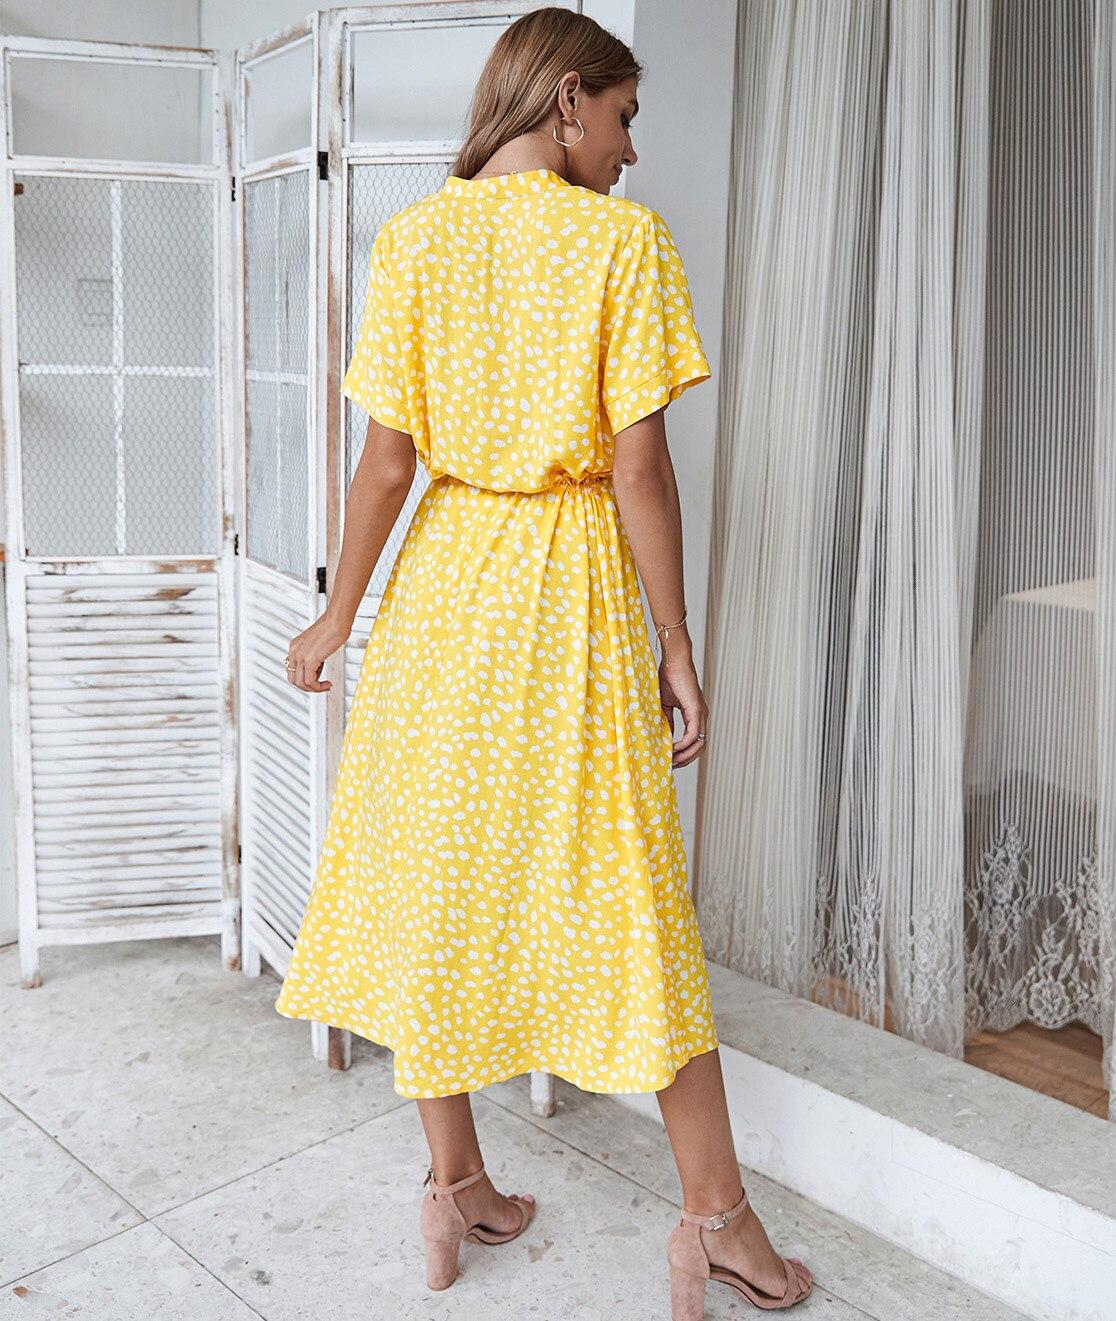 Dots Print White Short Sleeve Midi Boho Beach Dress 13